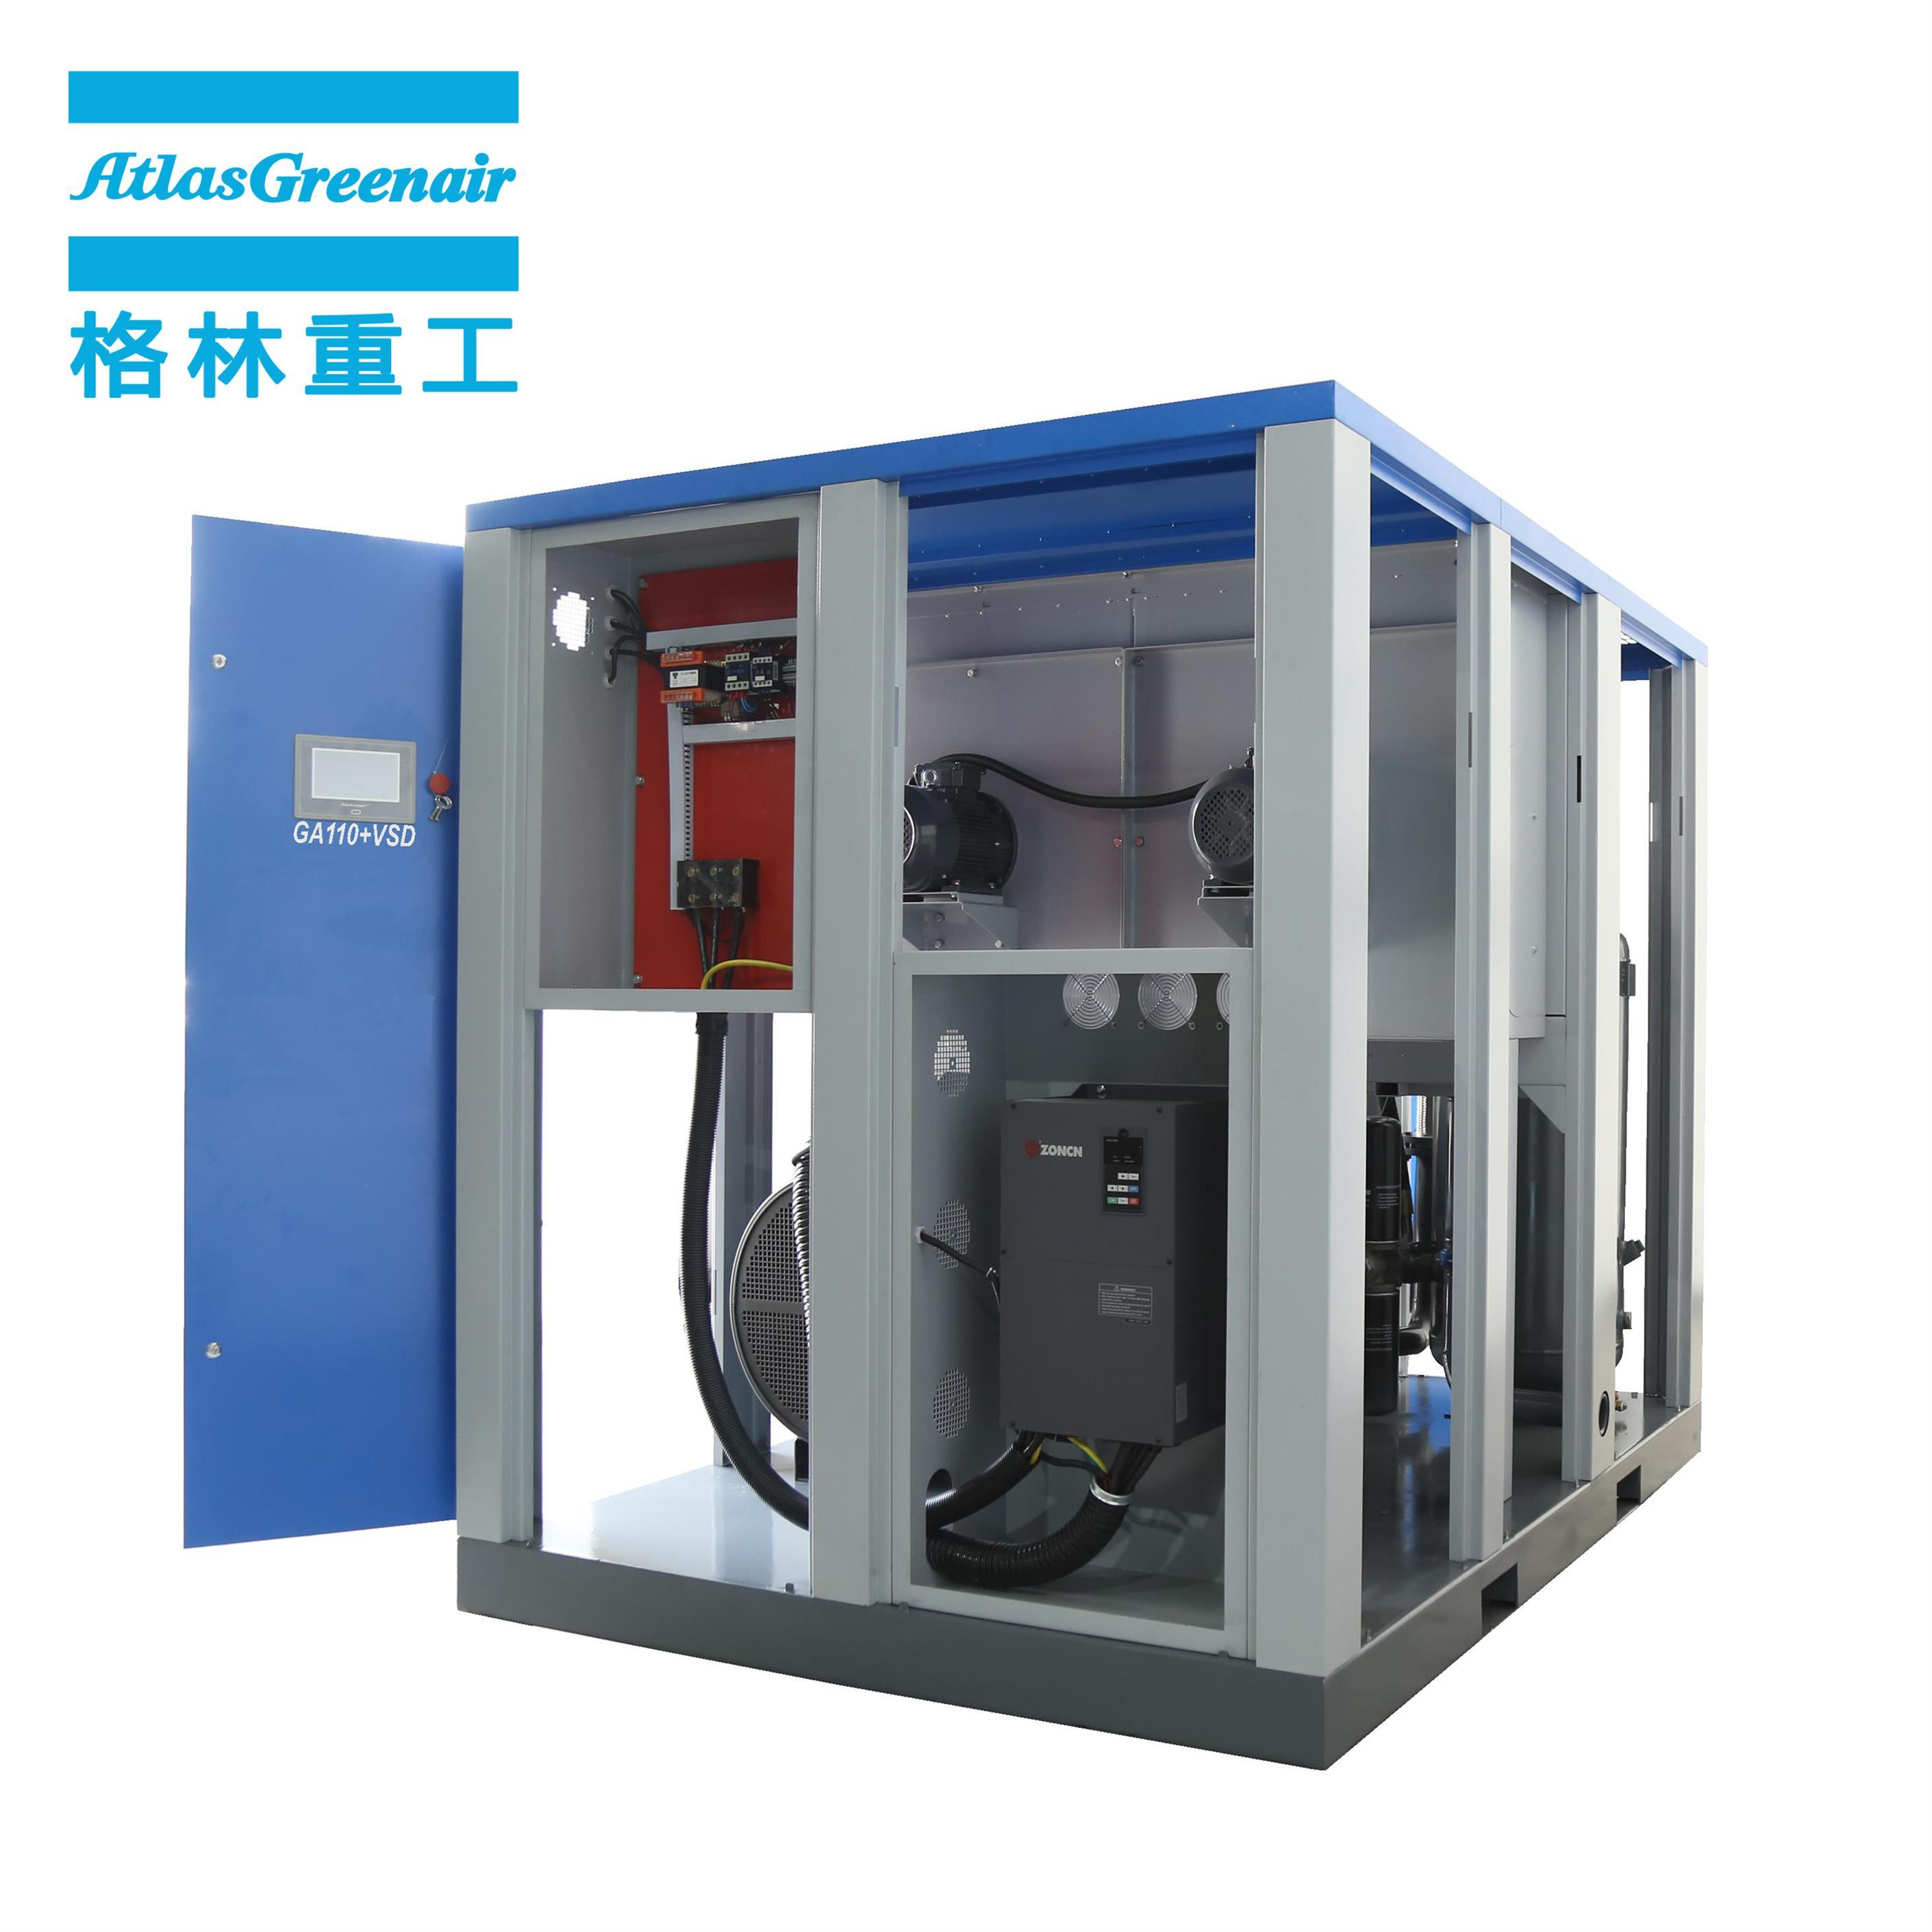 Atlas Greenair Screw Air Compressor vsd compressor atlas copco manufacturer for sale-1